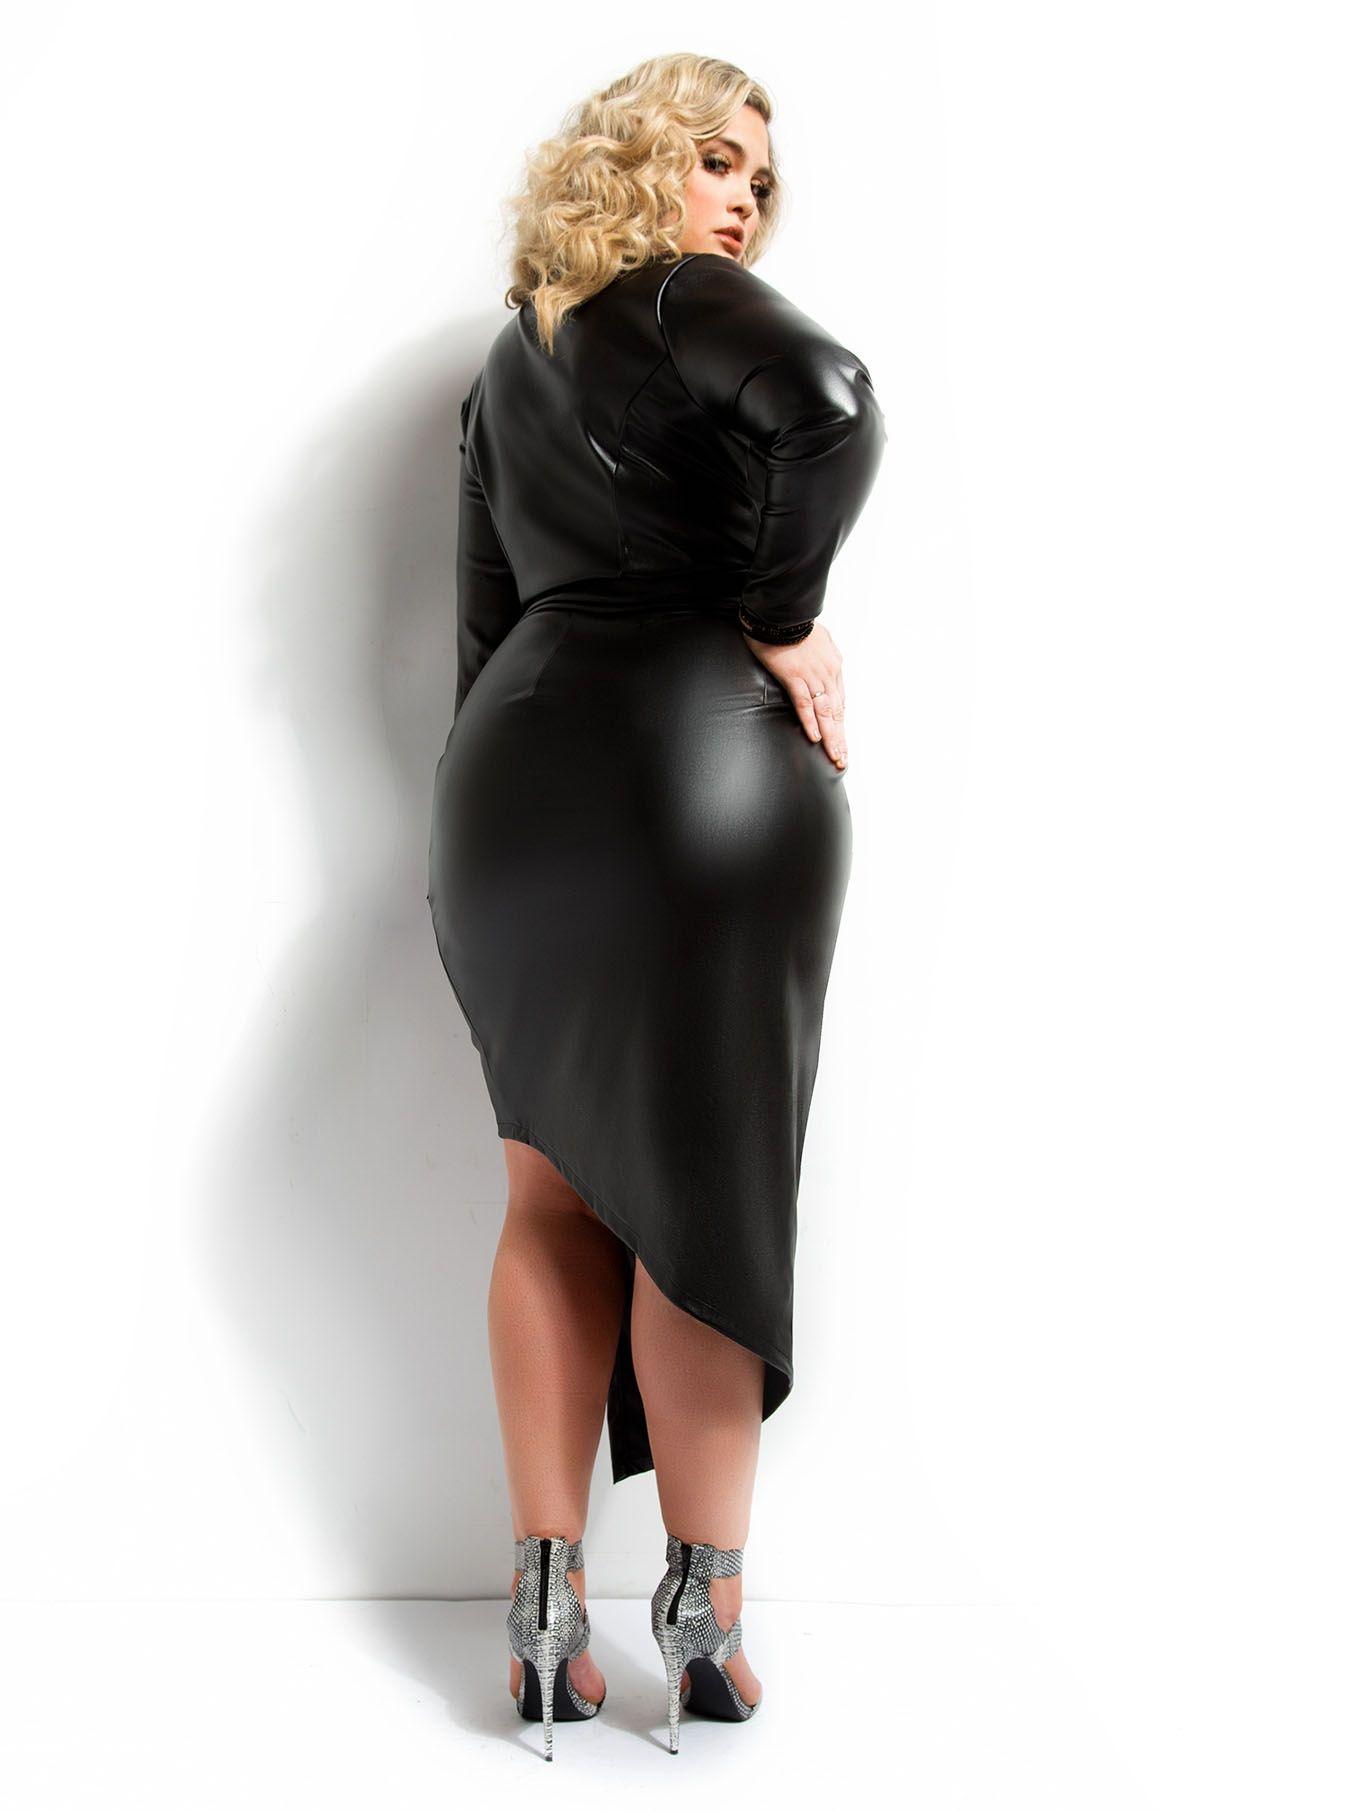 sexy #leather #dress backside.. | Curvy Women | Pinterest ...